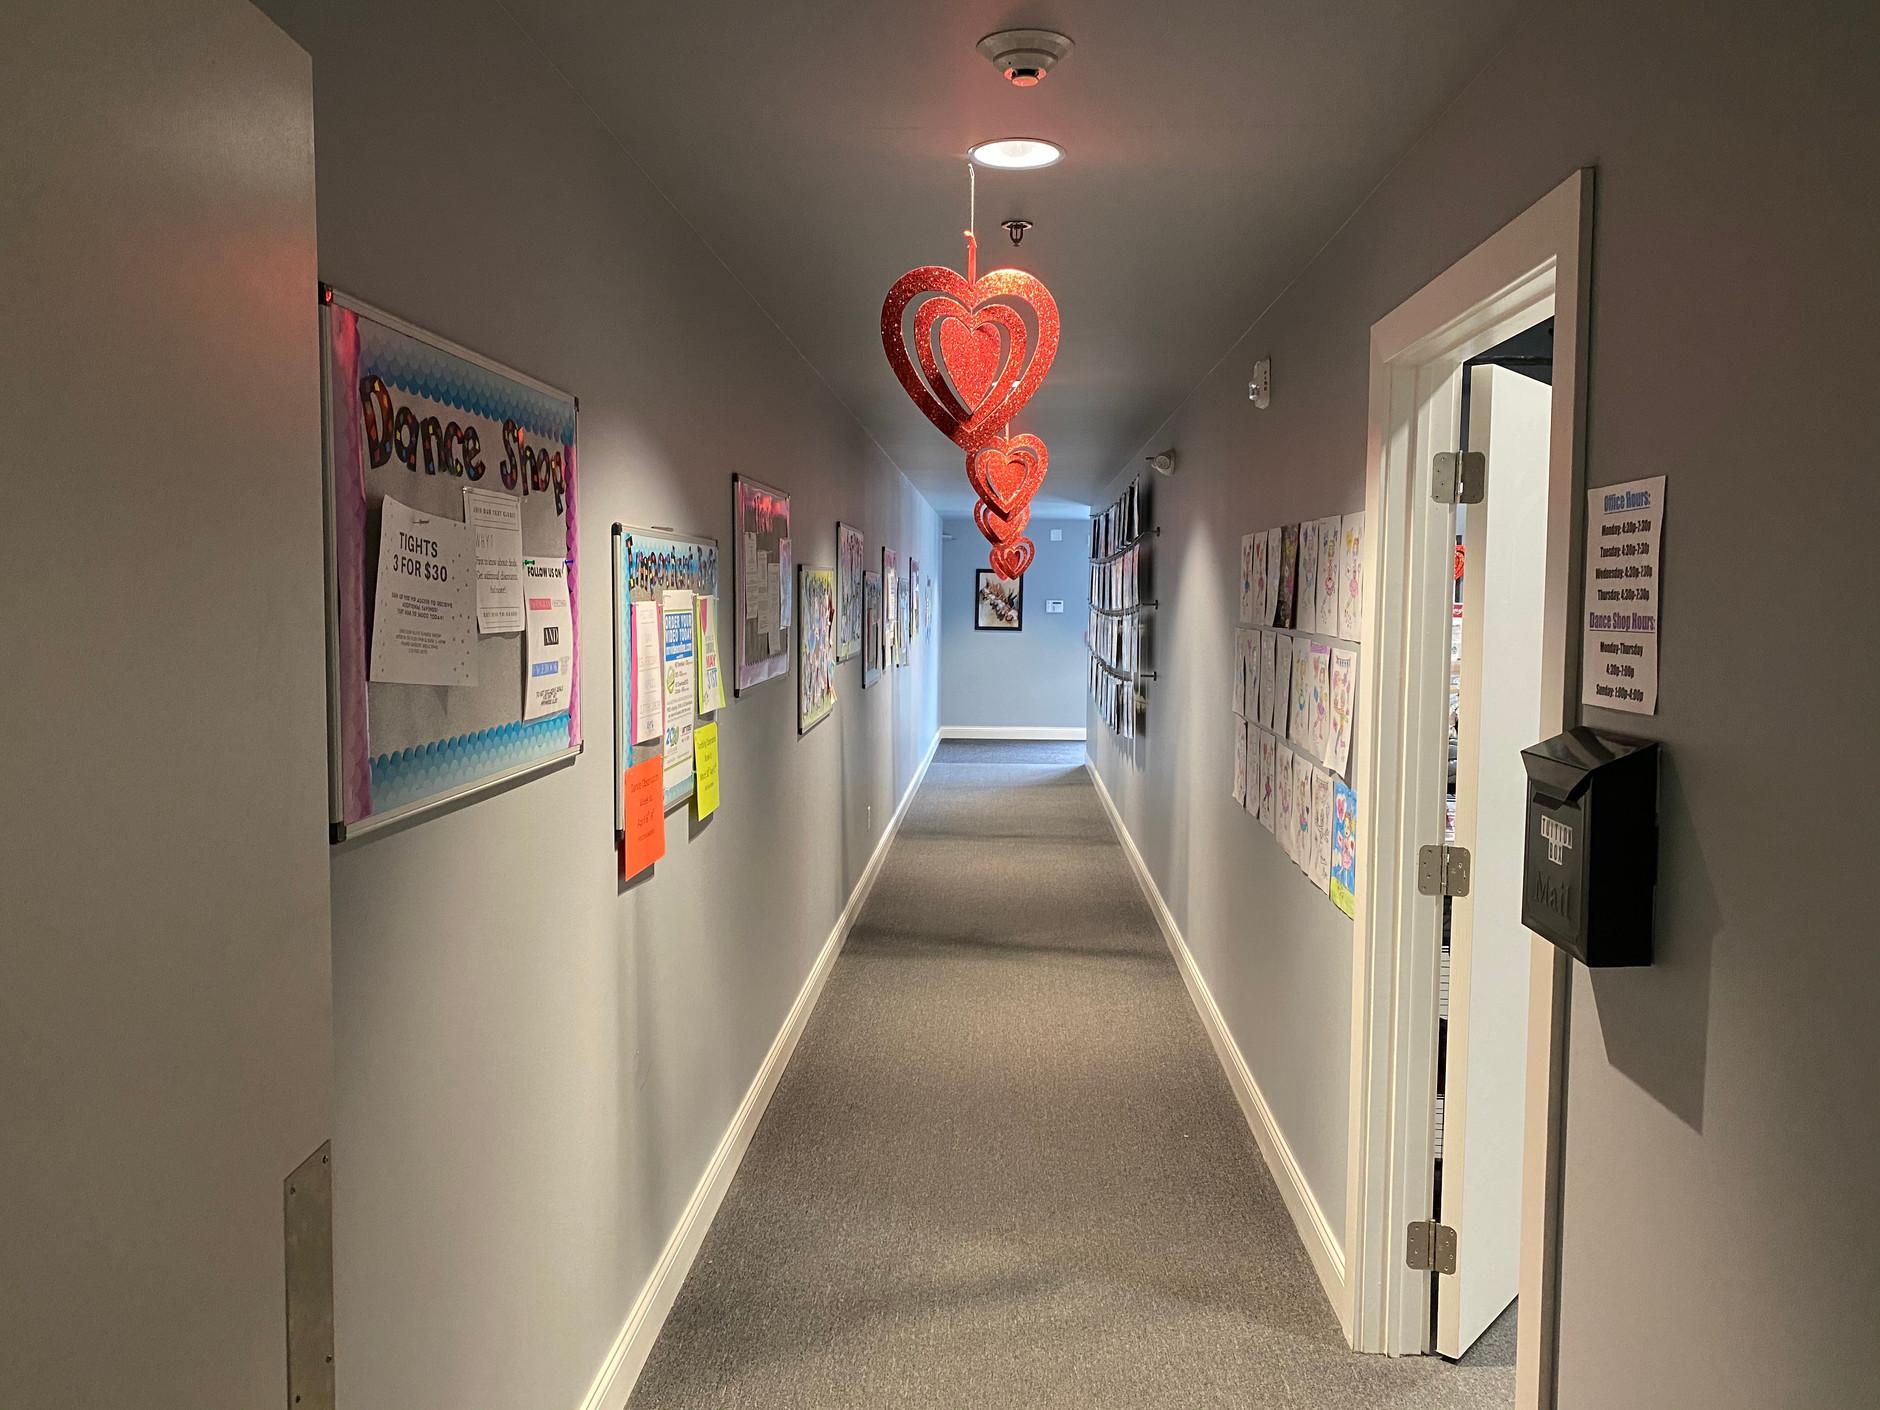 CESOD Entrance Hallway, Left -News Boards, Right - One Stop Elite Dance Shop